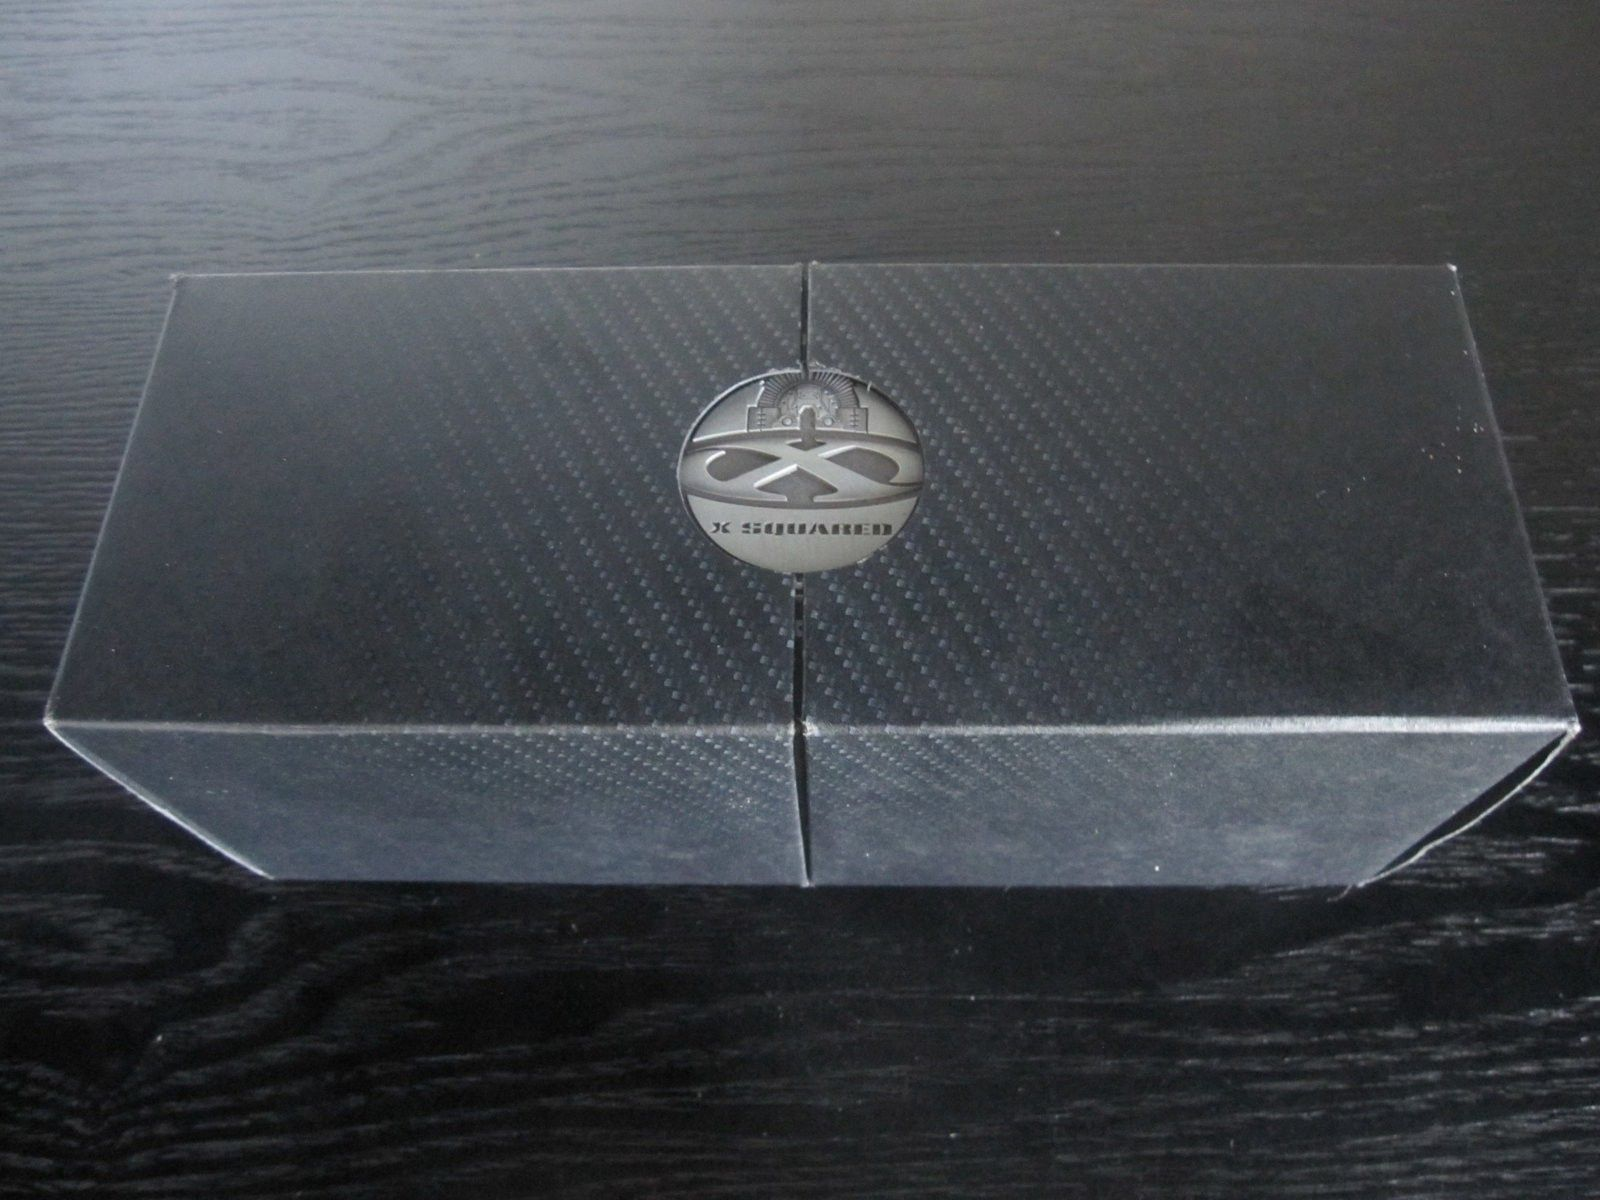 Box & coin for XS OO BIP - sku # 6011-08 - IMG_5544.JPG